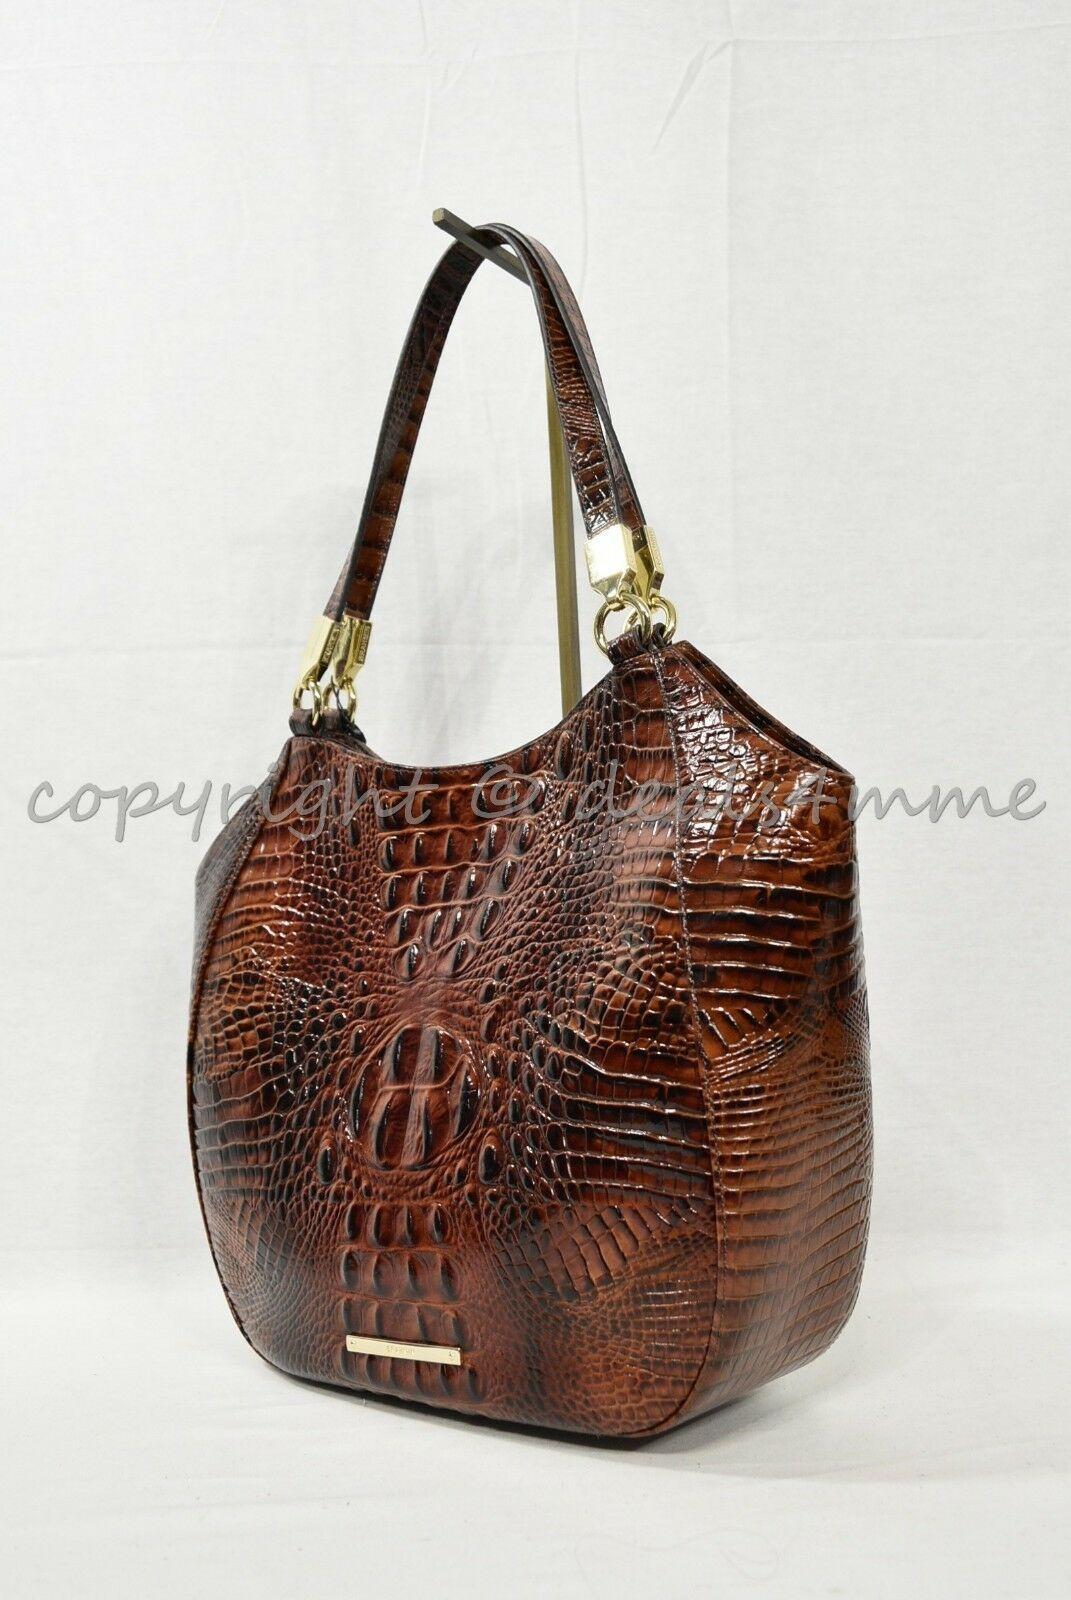 NWT Brahmin Marianna Leather Tote / Shoulder Bag in Pecan Melbourne